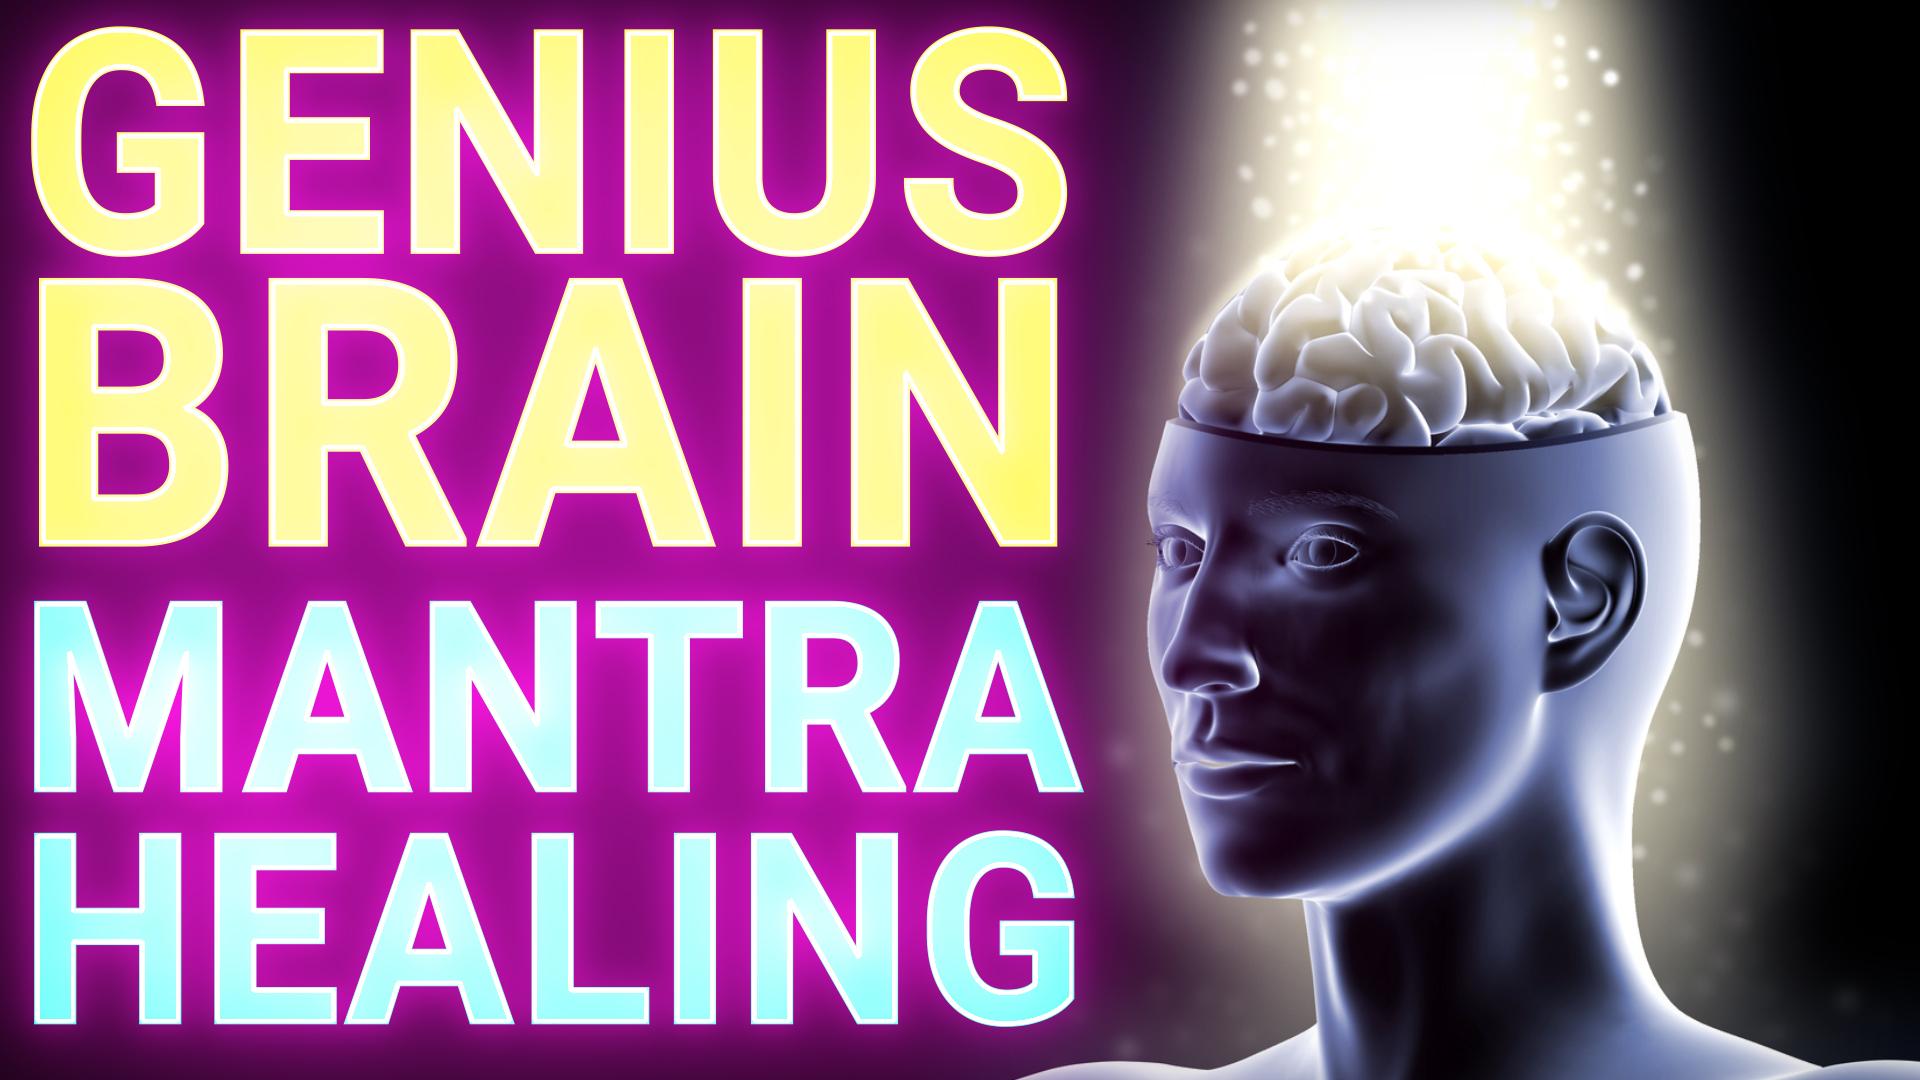 Free Session Genius Brain Mantra Healing